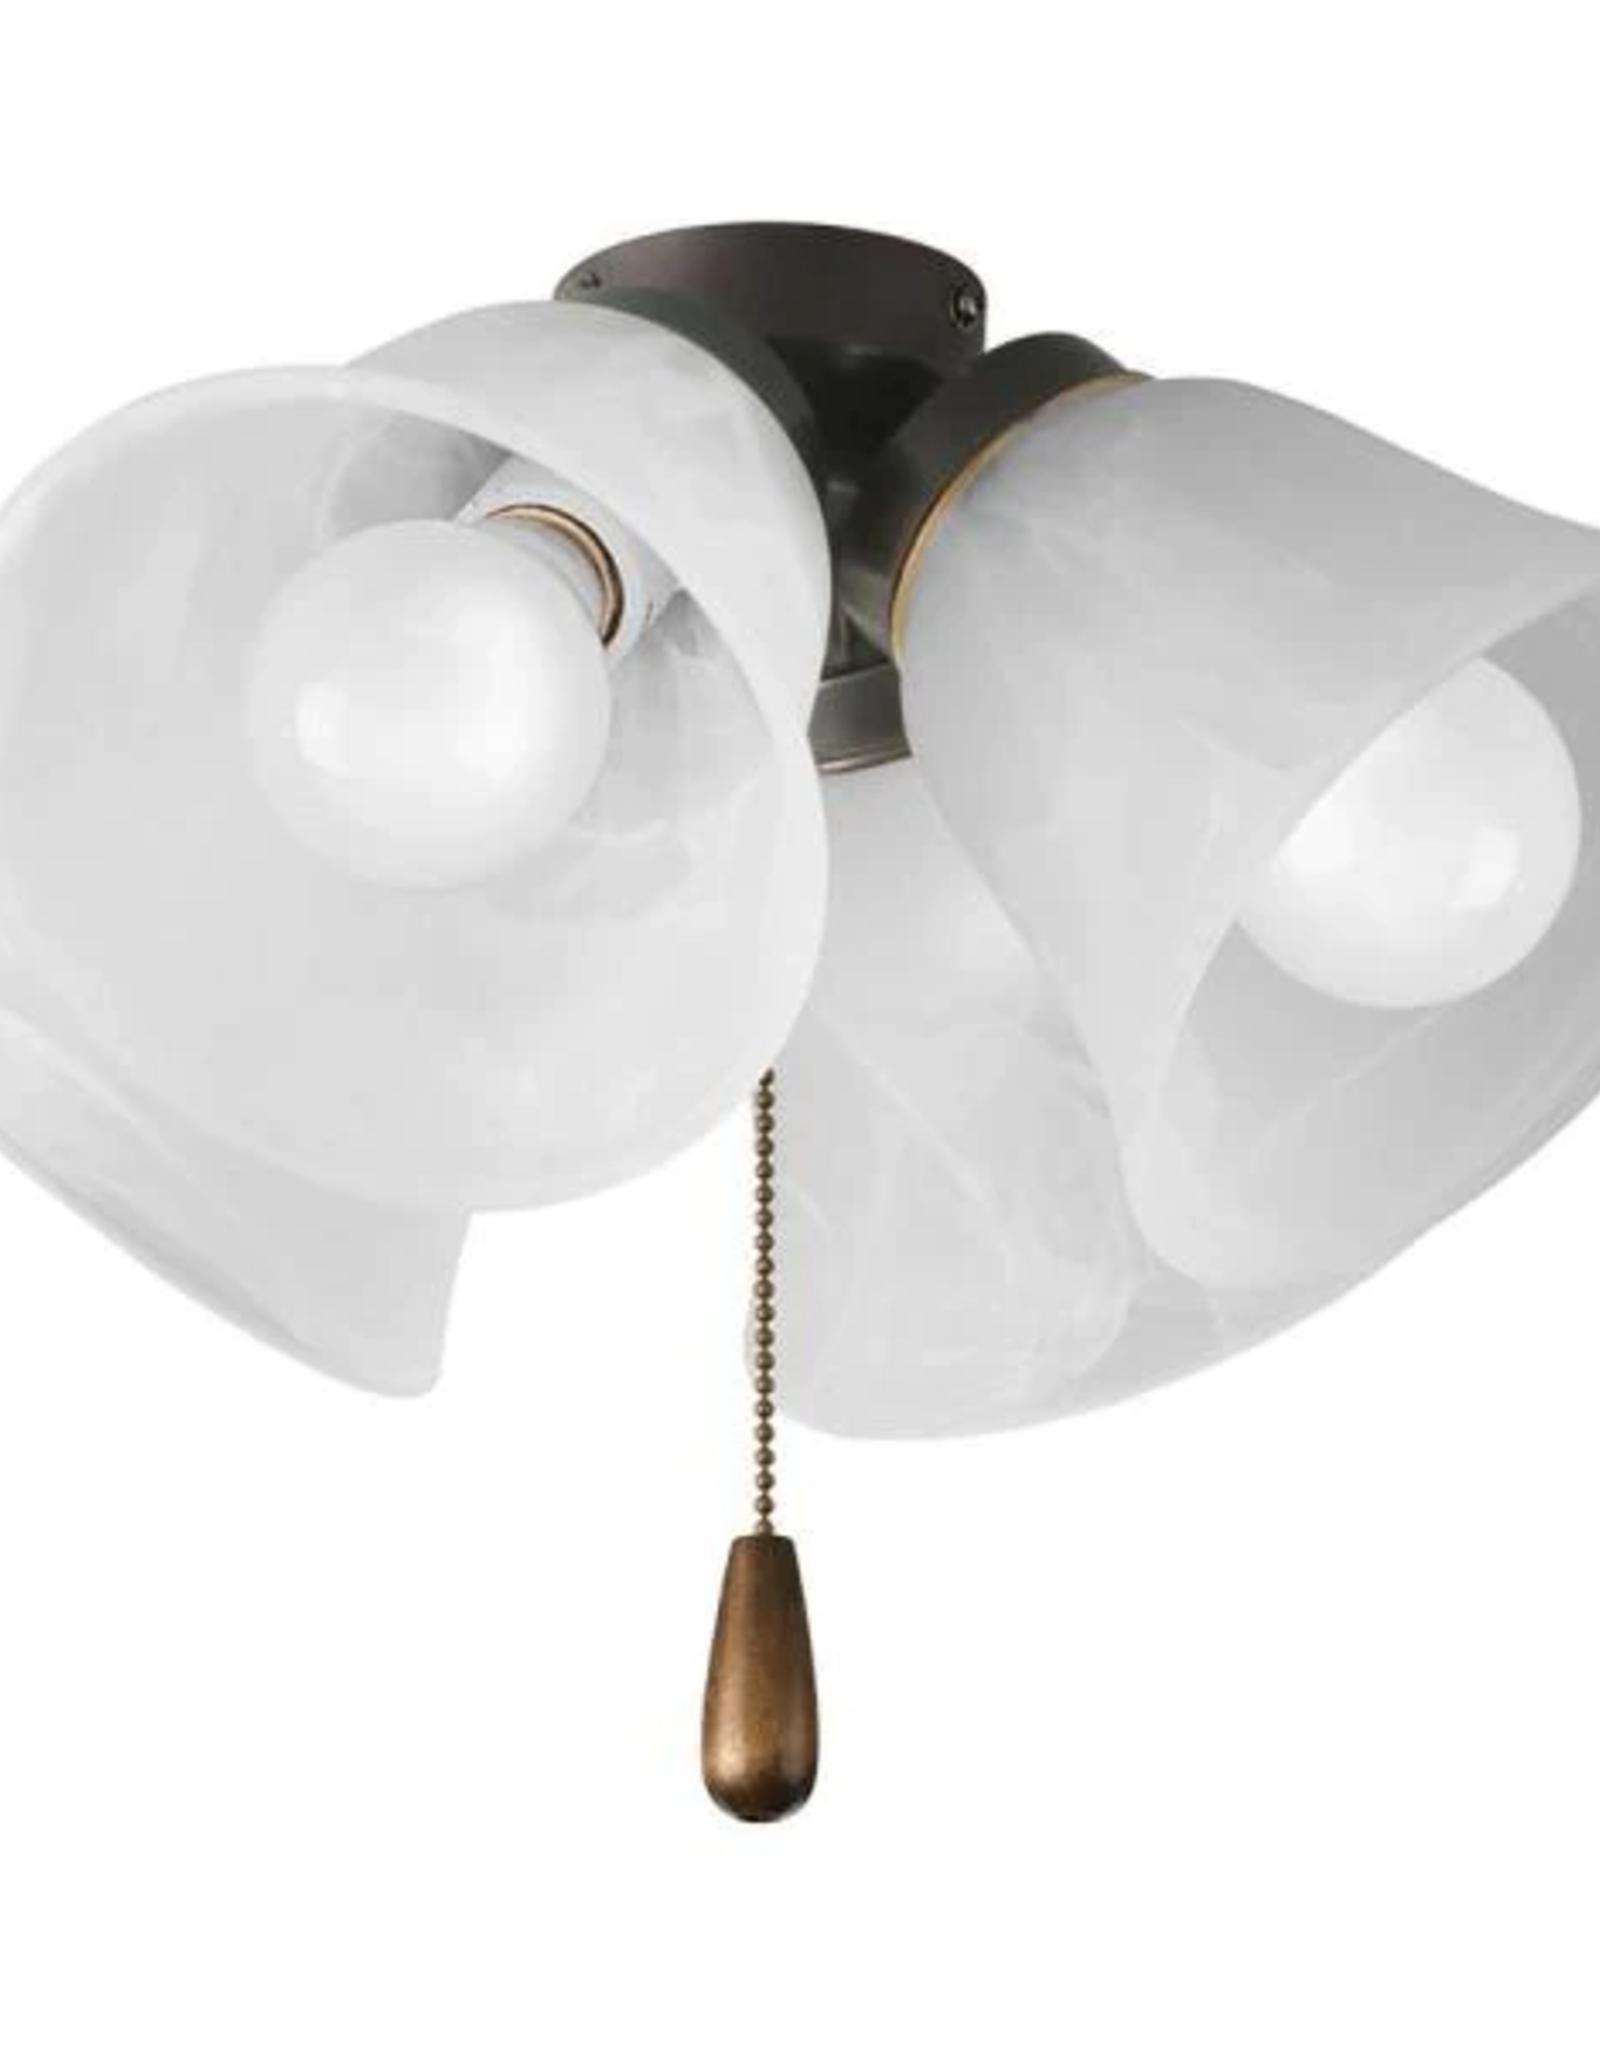 Fan Light Kits Collection 4 Light Antique Bronze Ceiling Fan Light Kit Low Tide Liquidation